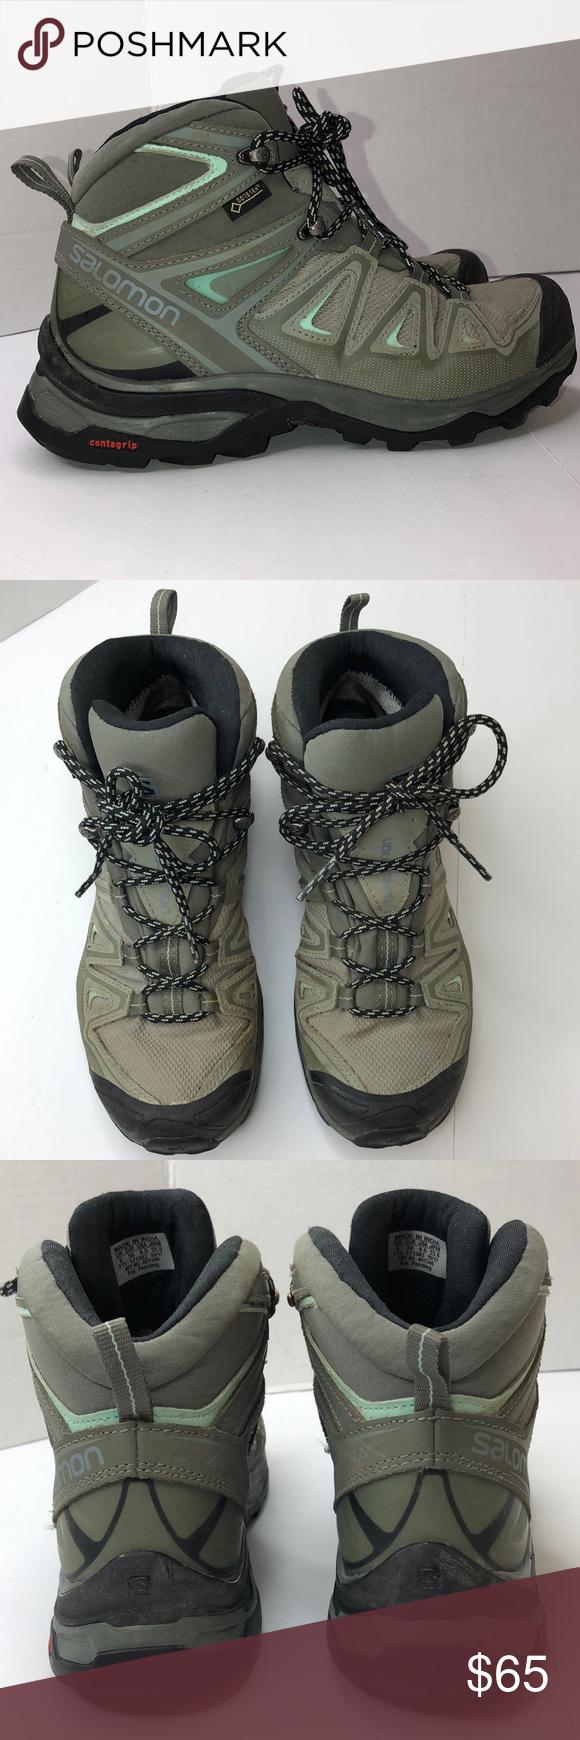 Salomon Gore-Tex X-Ultra  Mid hiking Boots size 5 Women's Salomon Gore-Tex X-U…